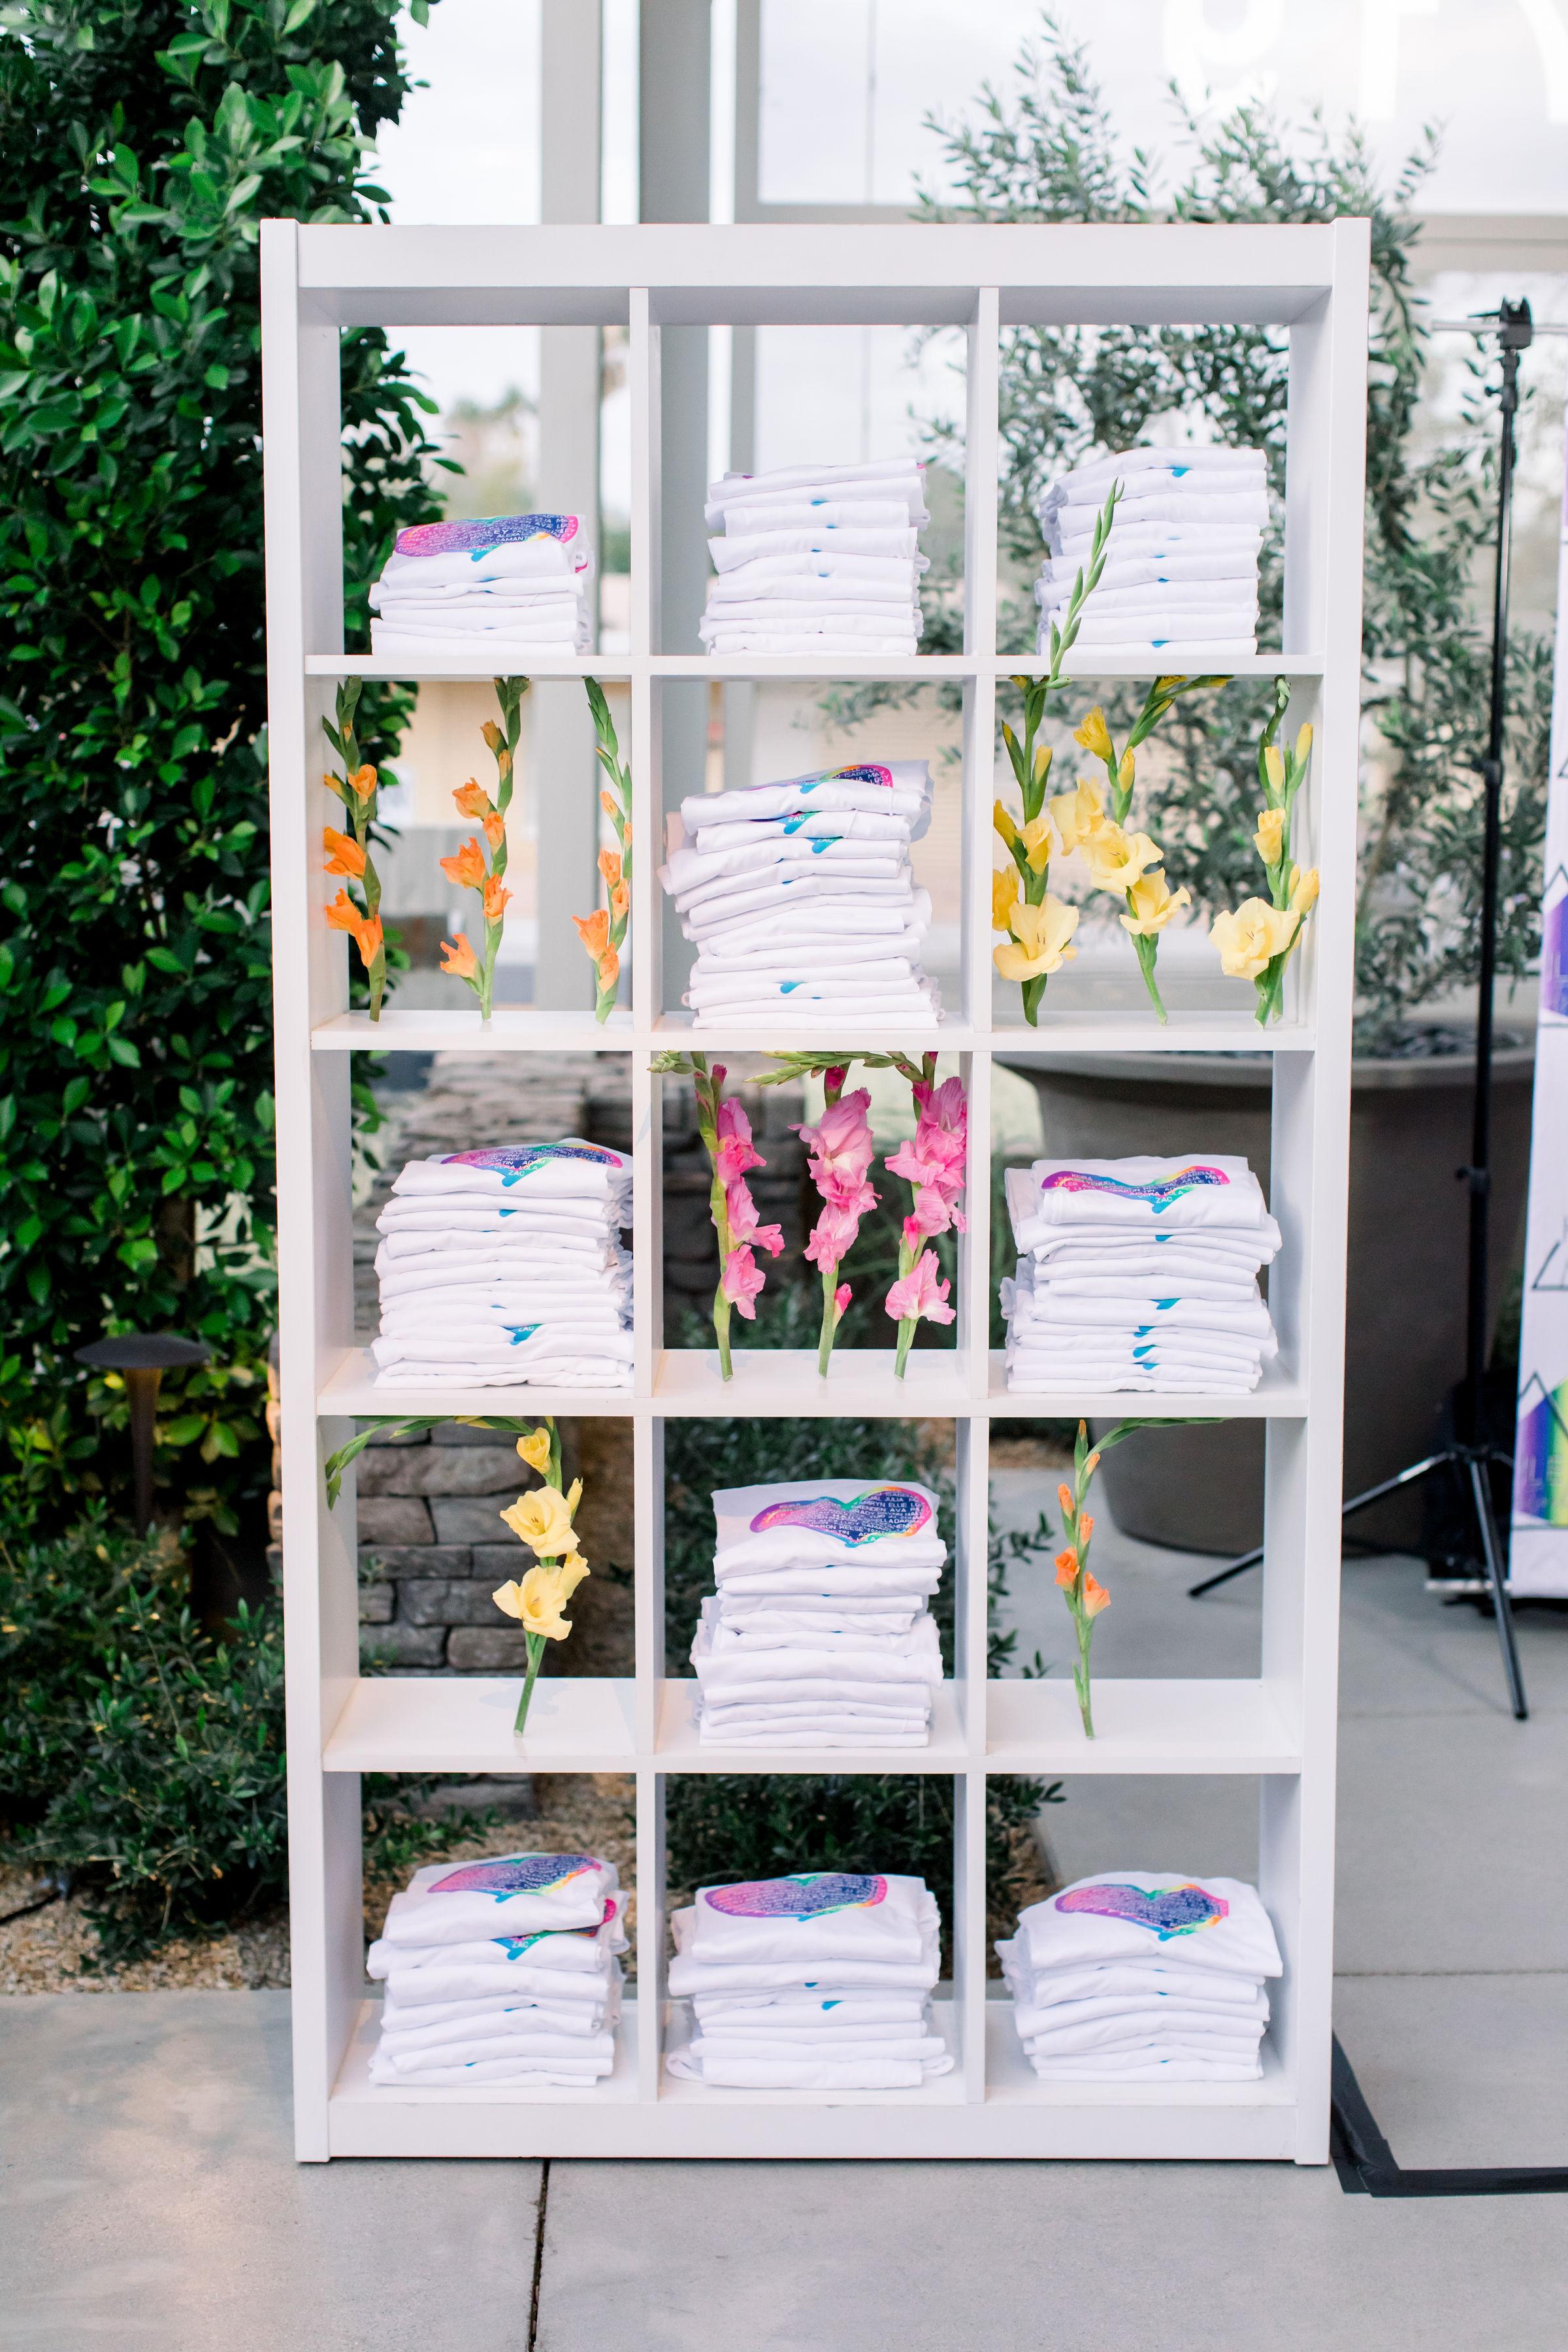 16 bud vases rainbow flowers folded tshirts custom designed tshirts bat mitzvah party Life Design Events photos by Stephanie Heymann Photography.jpg